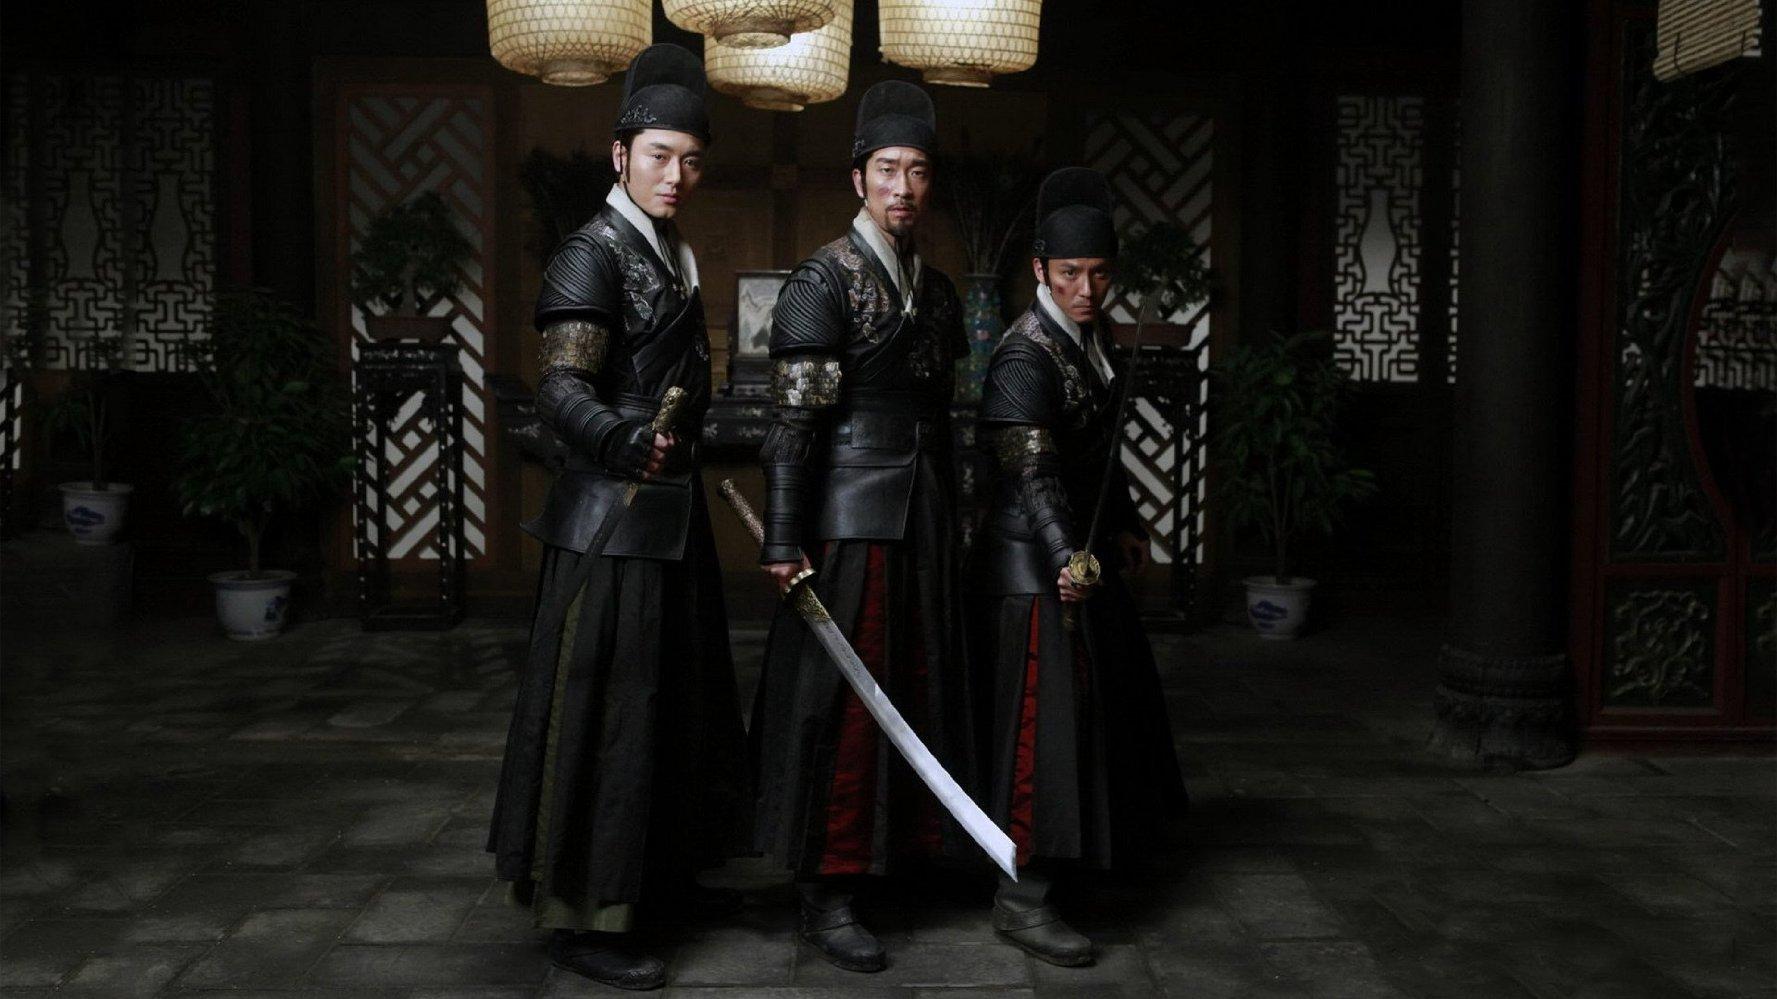 Brotherhood Of Blades [Audio: China]